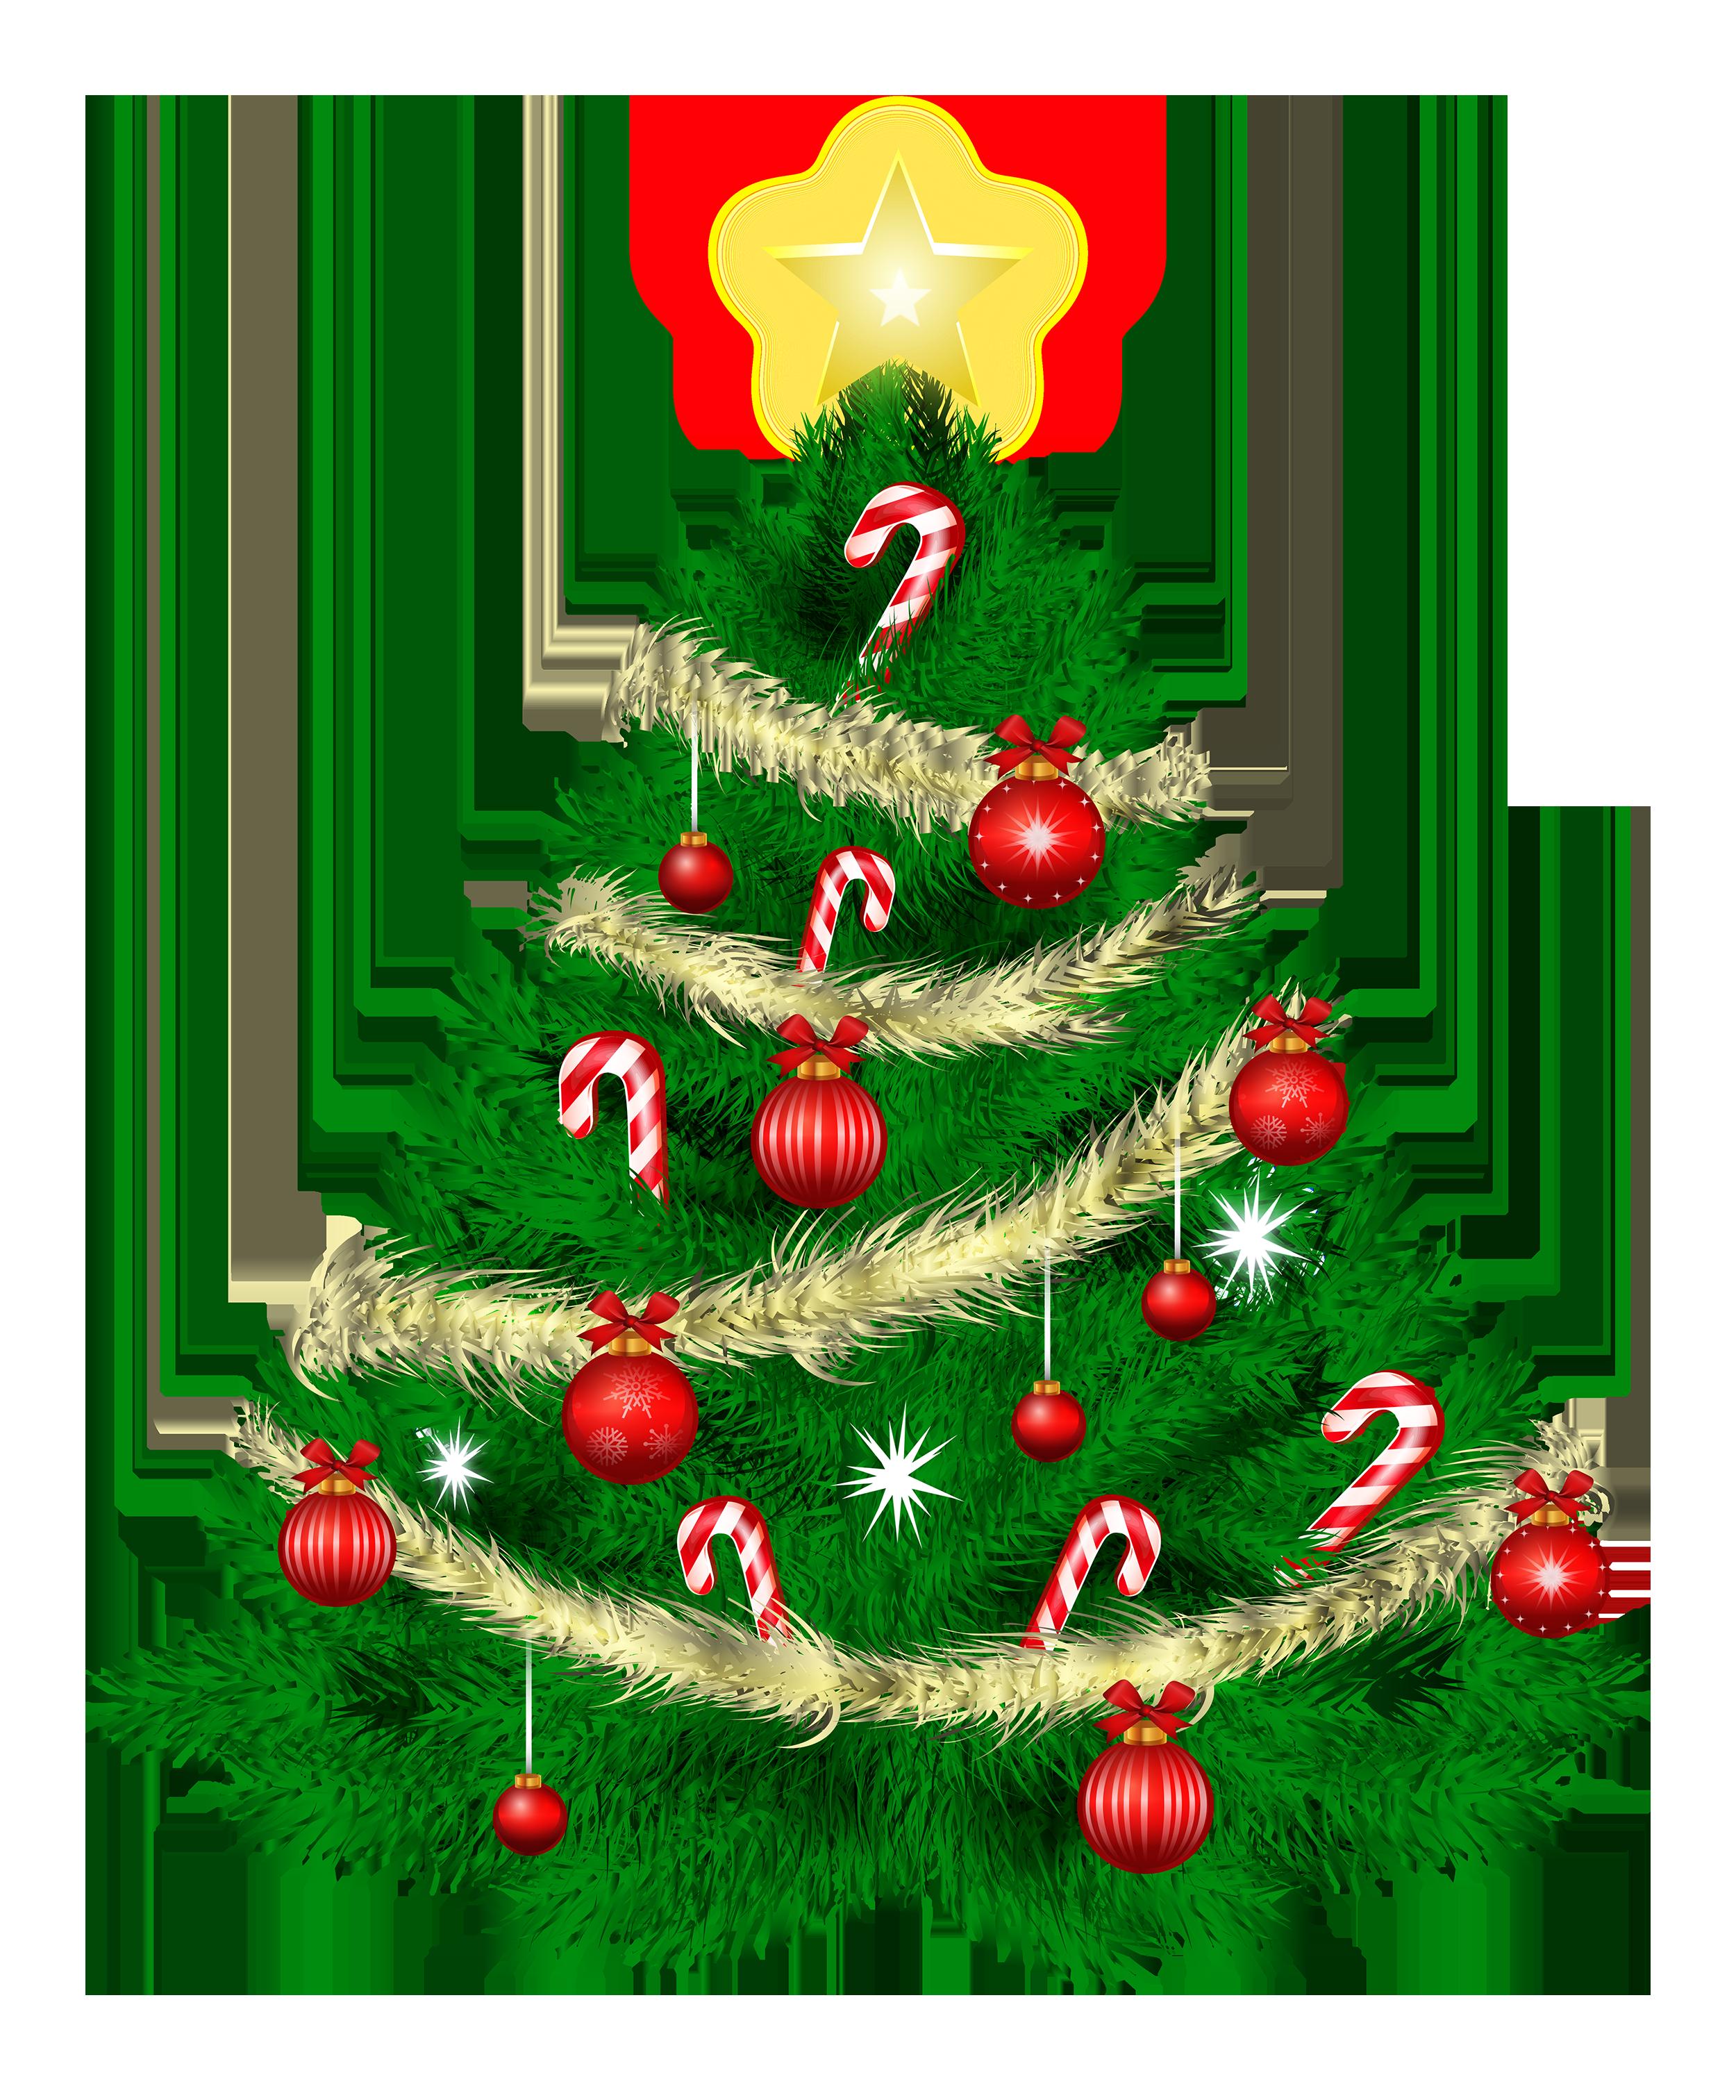 christmas tree ornaments transparent pictures 35273 golf ball clip art transparent background golf balls clip art